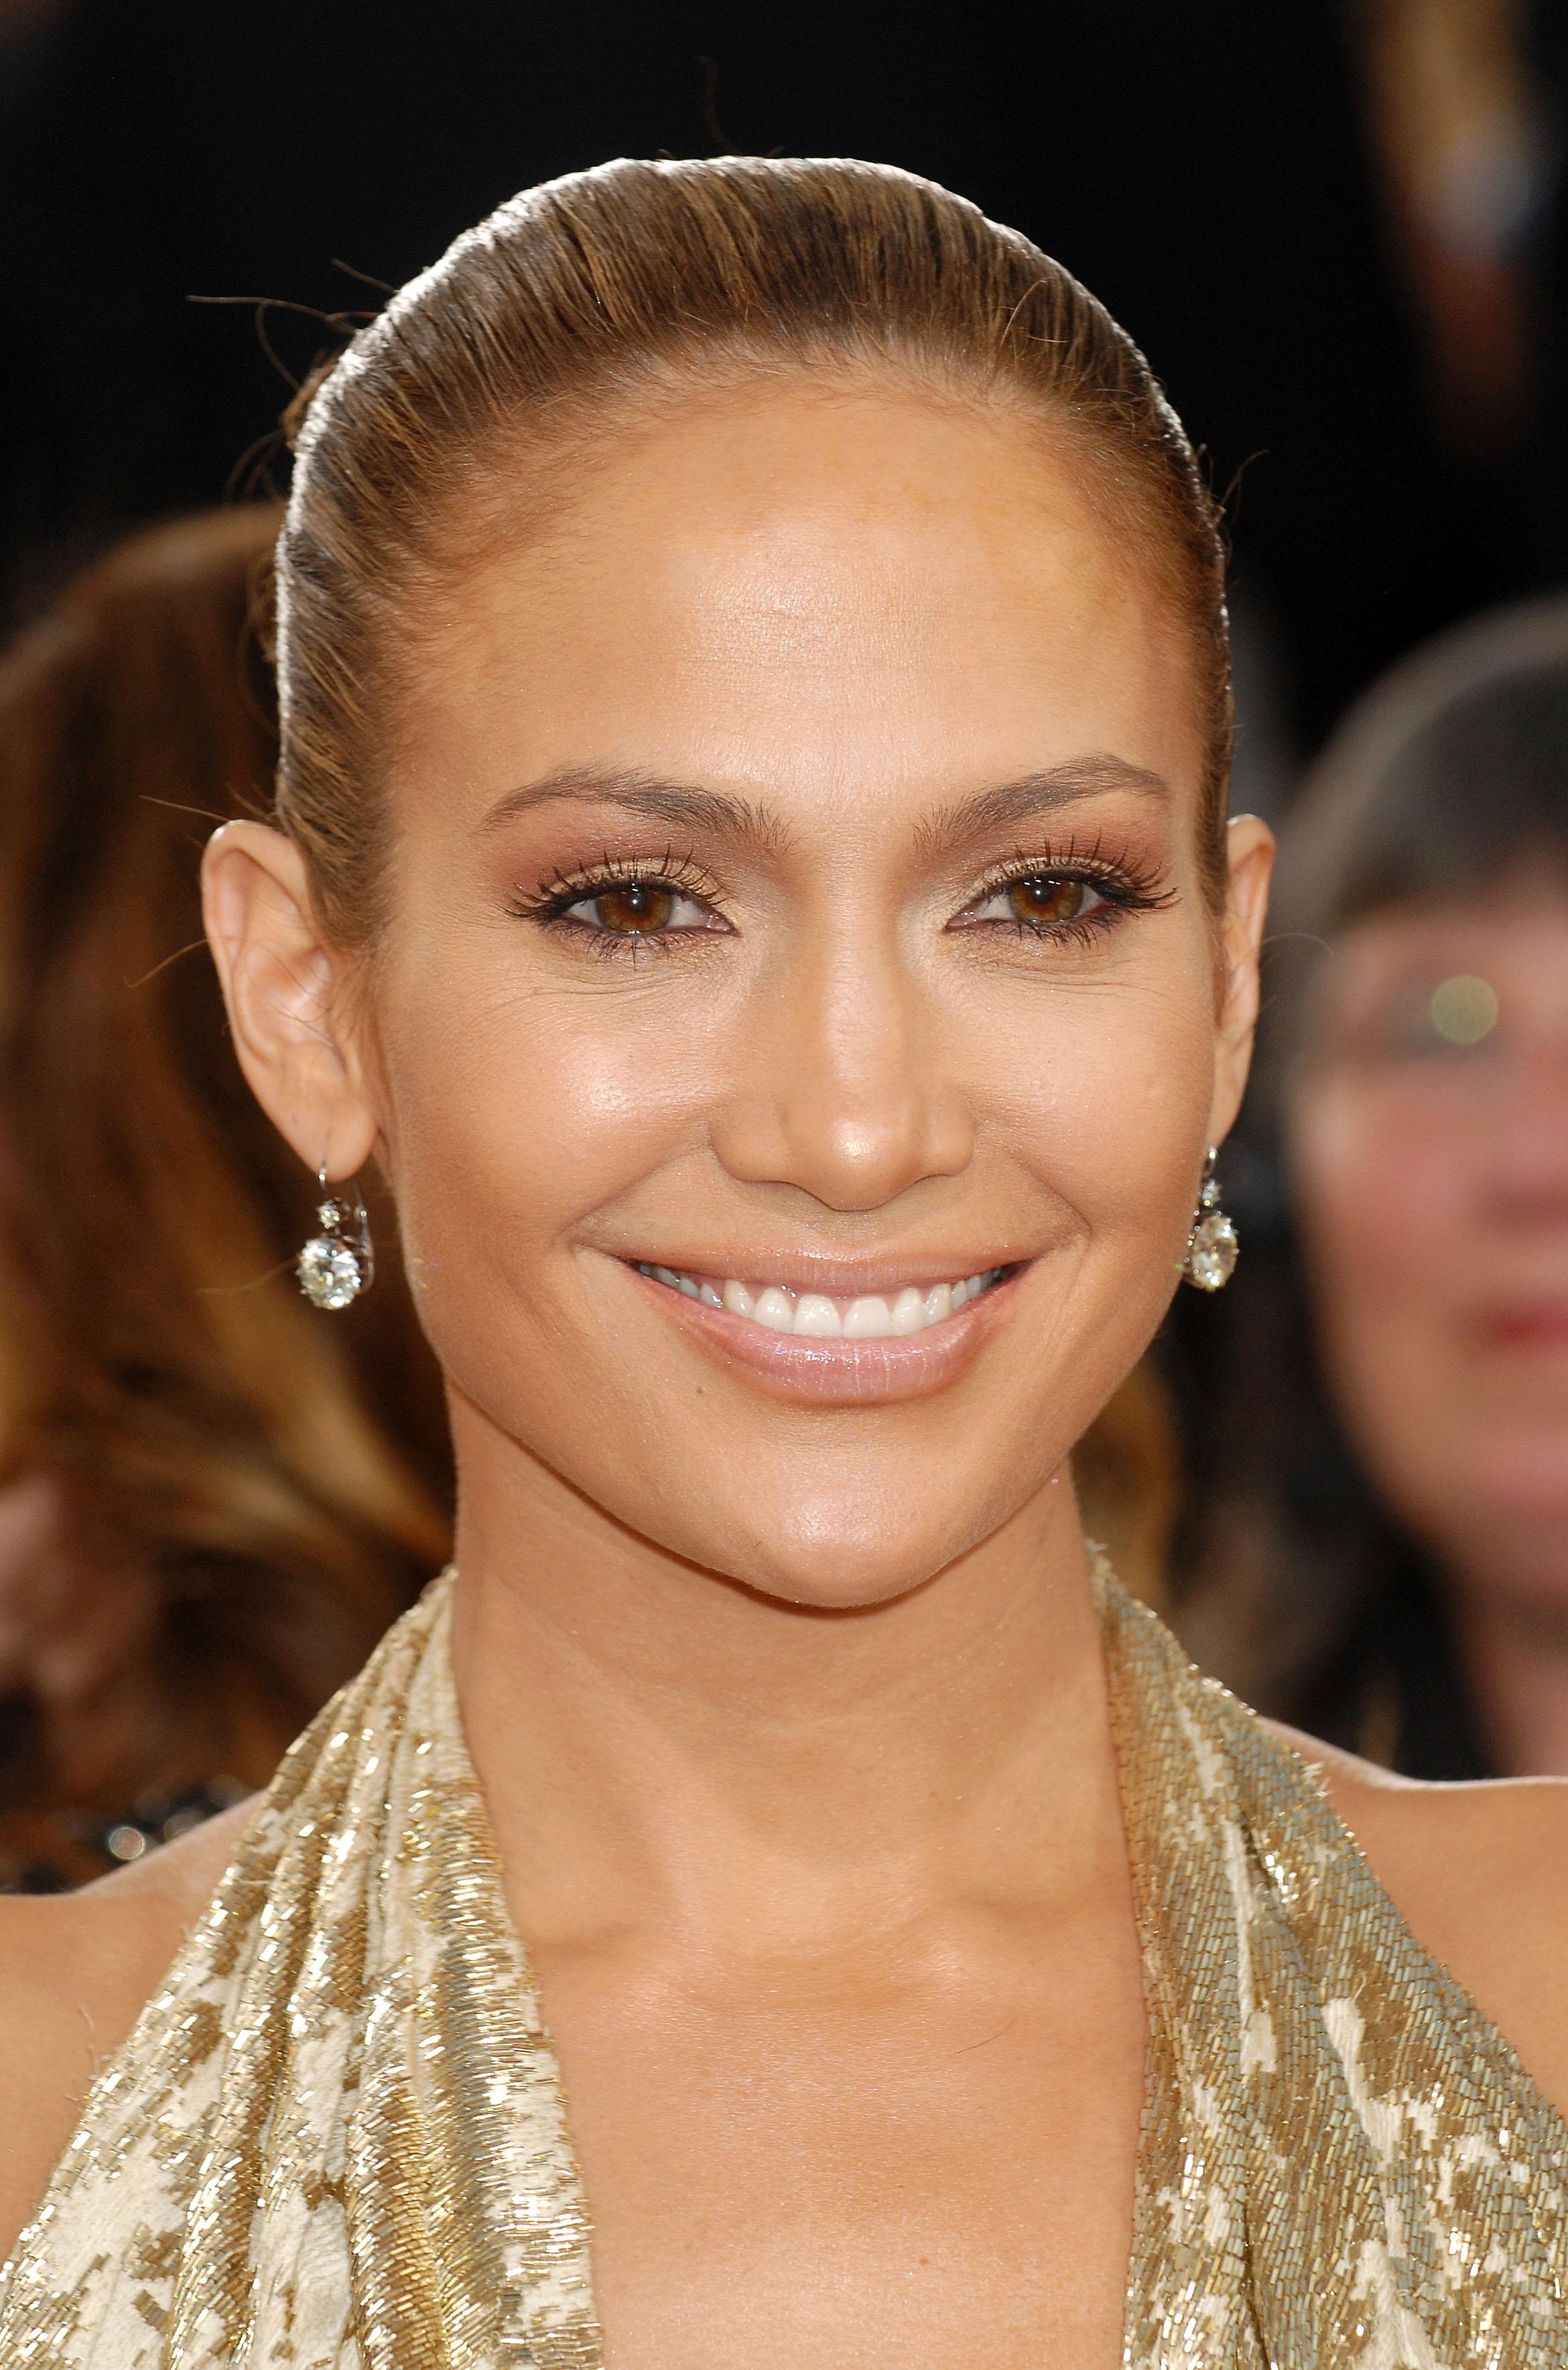 29136_Celebutopia-Jennifer_Lopez_arrives_at_the_66th_Annual_Golden_Globe_Awards-06_122_224lo.JPG